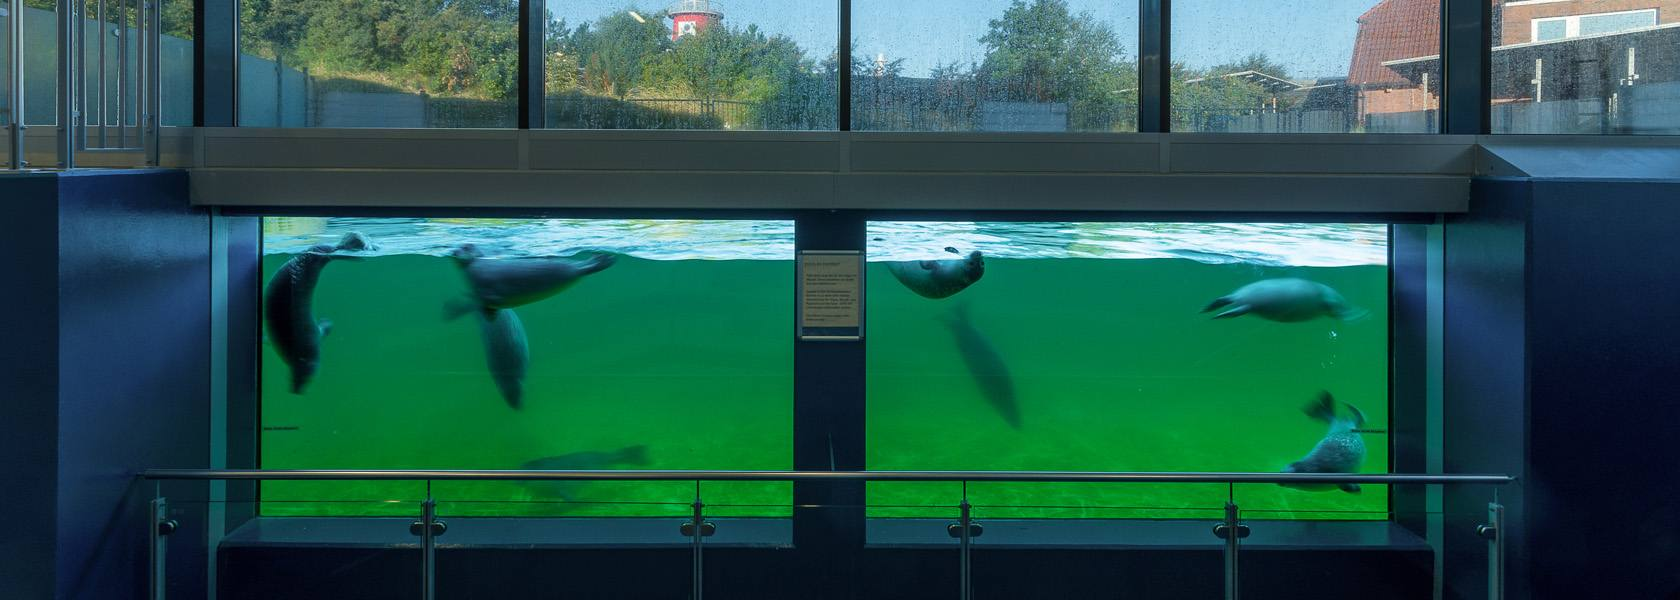 Unterwasserfenster der Seehundstation Nationalpark-Haus Norden-Norddeich, © Seehundstation Norddeich, Christian Ballé